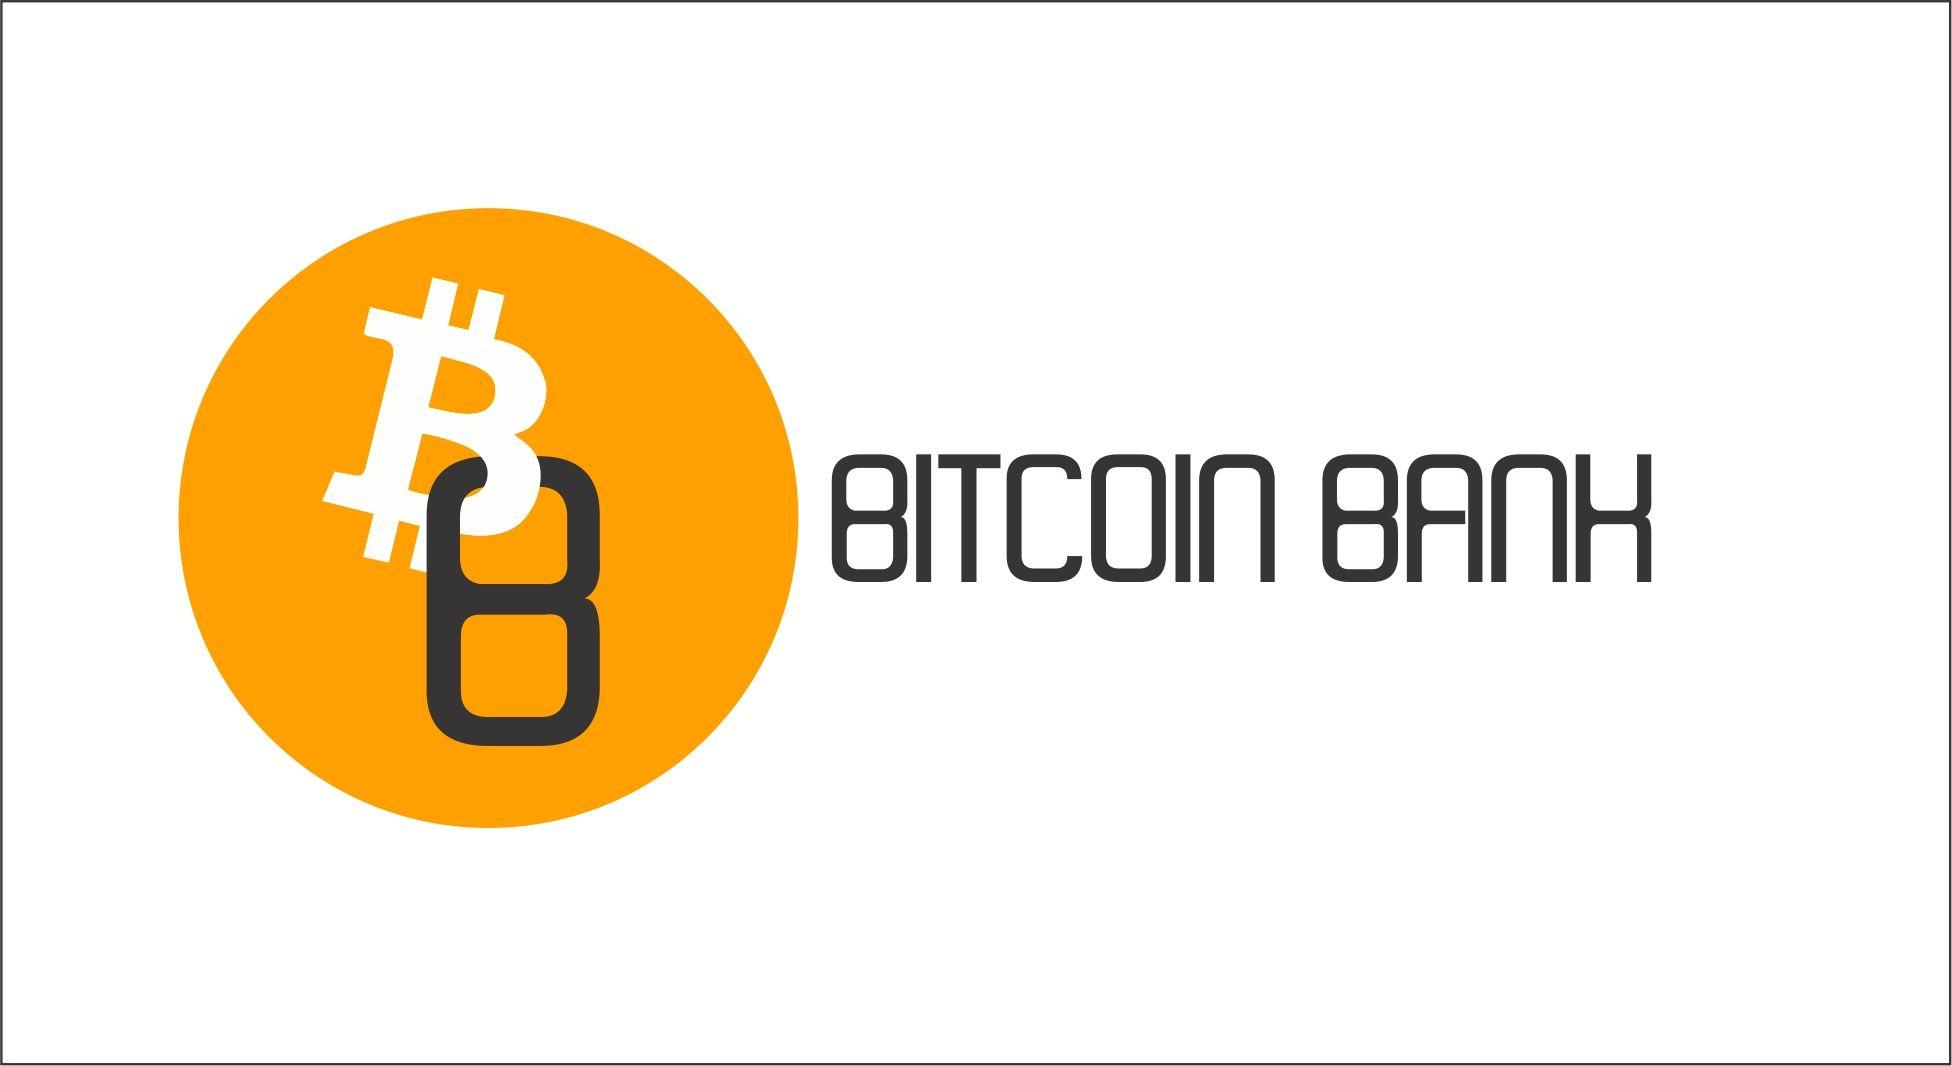 BitcoinBank - Логотип - дизайнер 79156510795